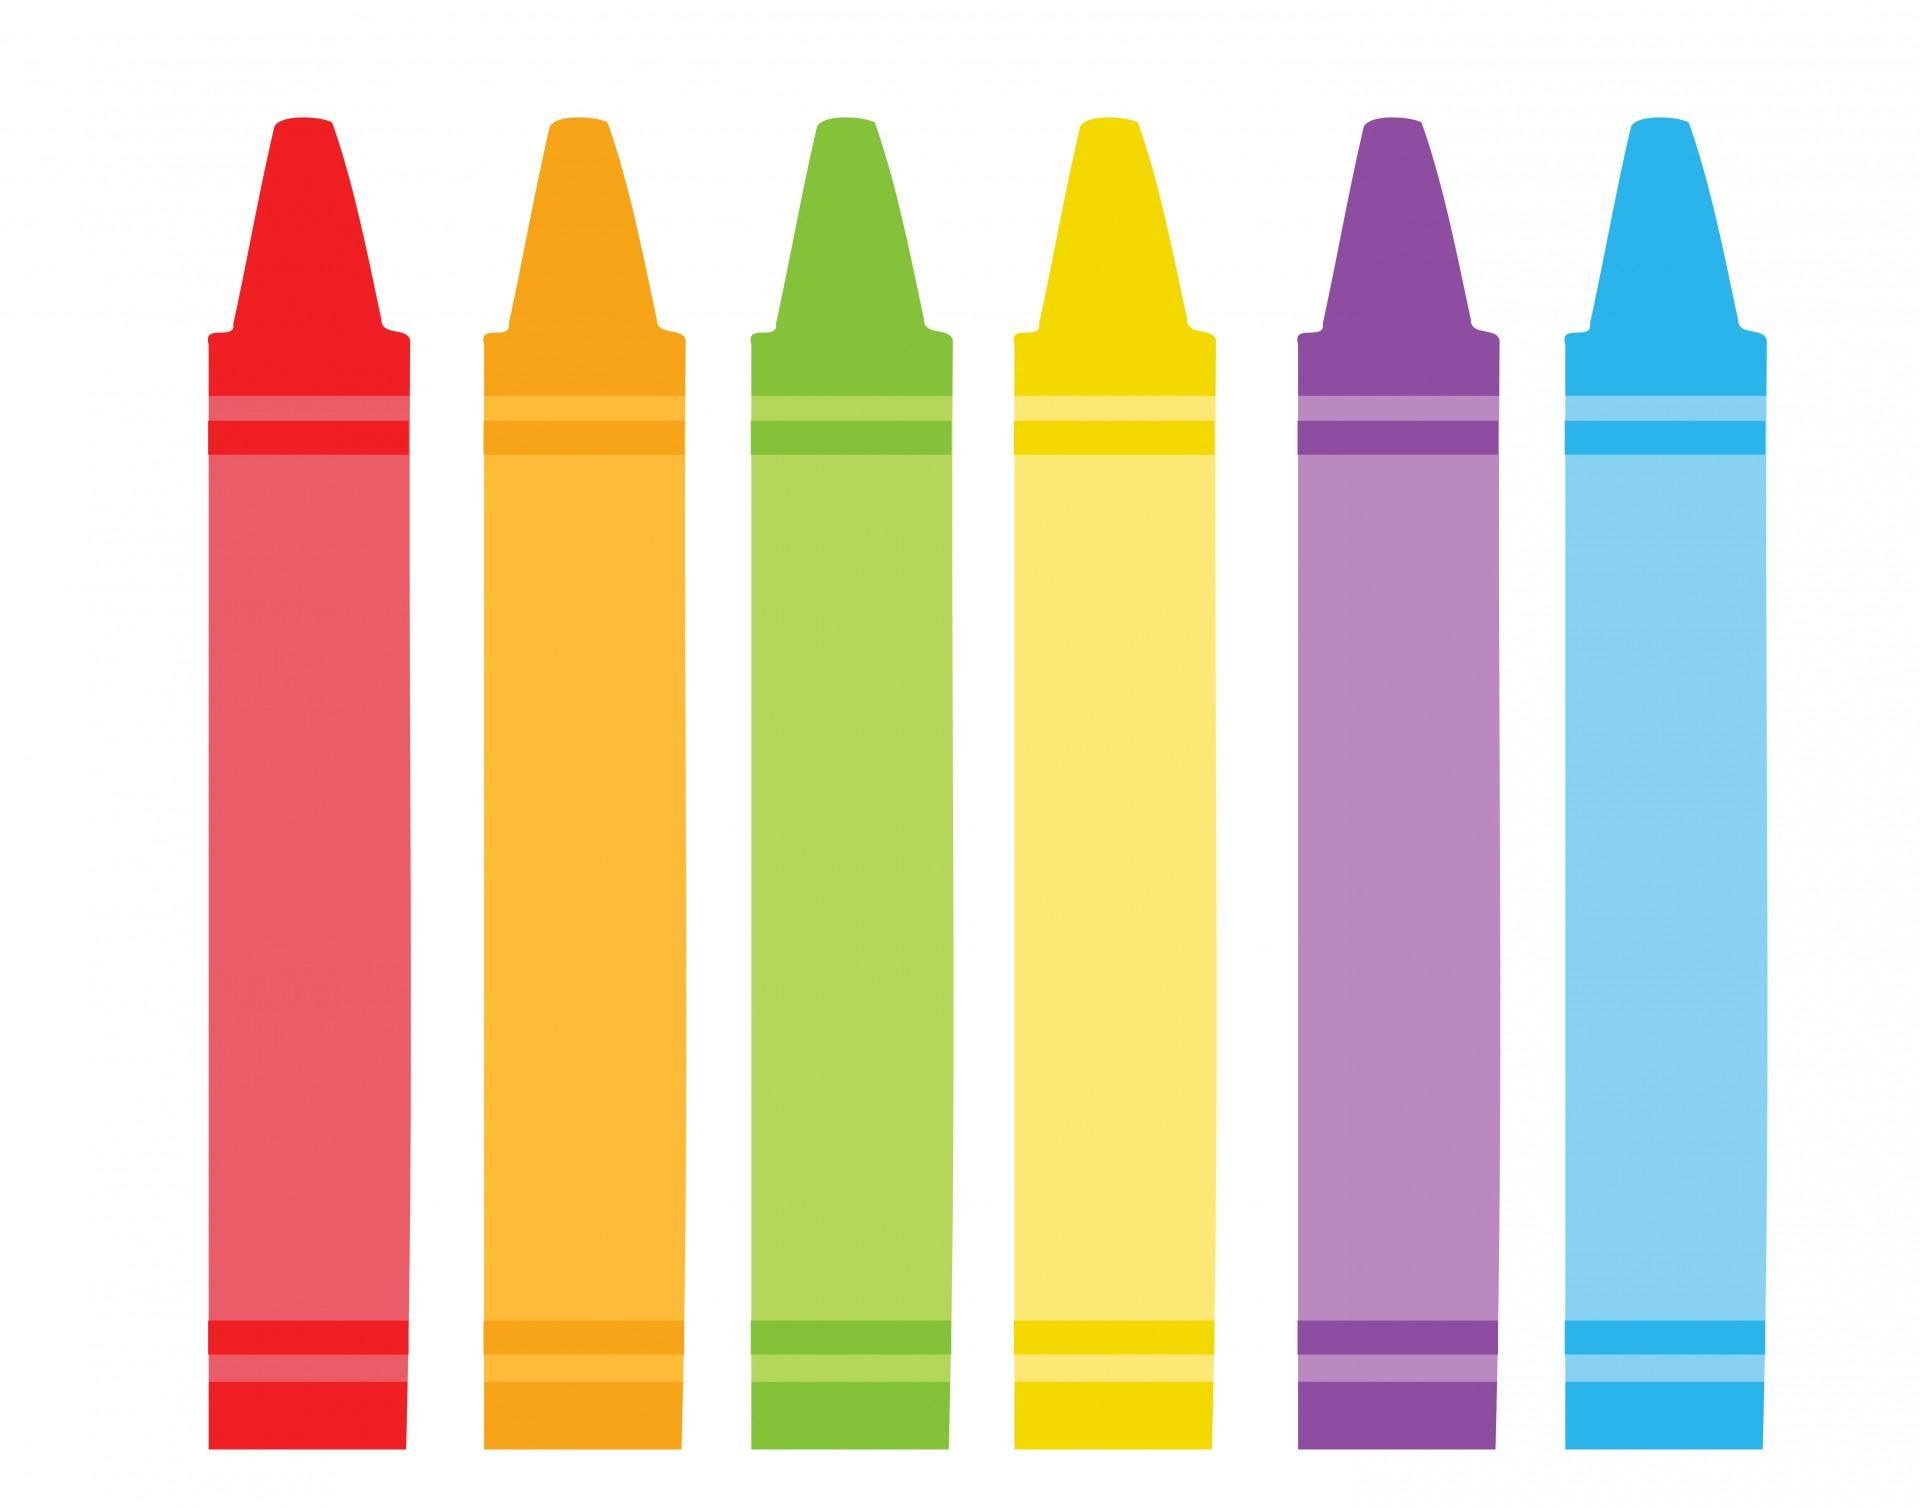 Free Crayons Cliparts, Download Free Clip Art, Free Clip Art.